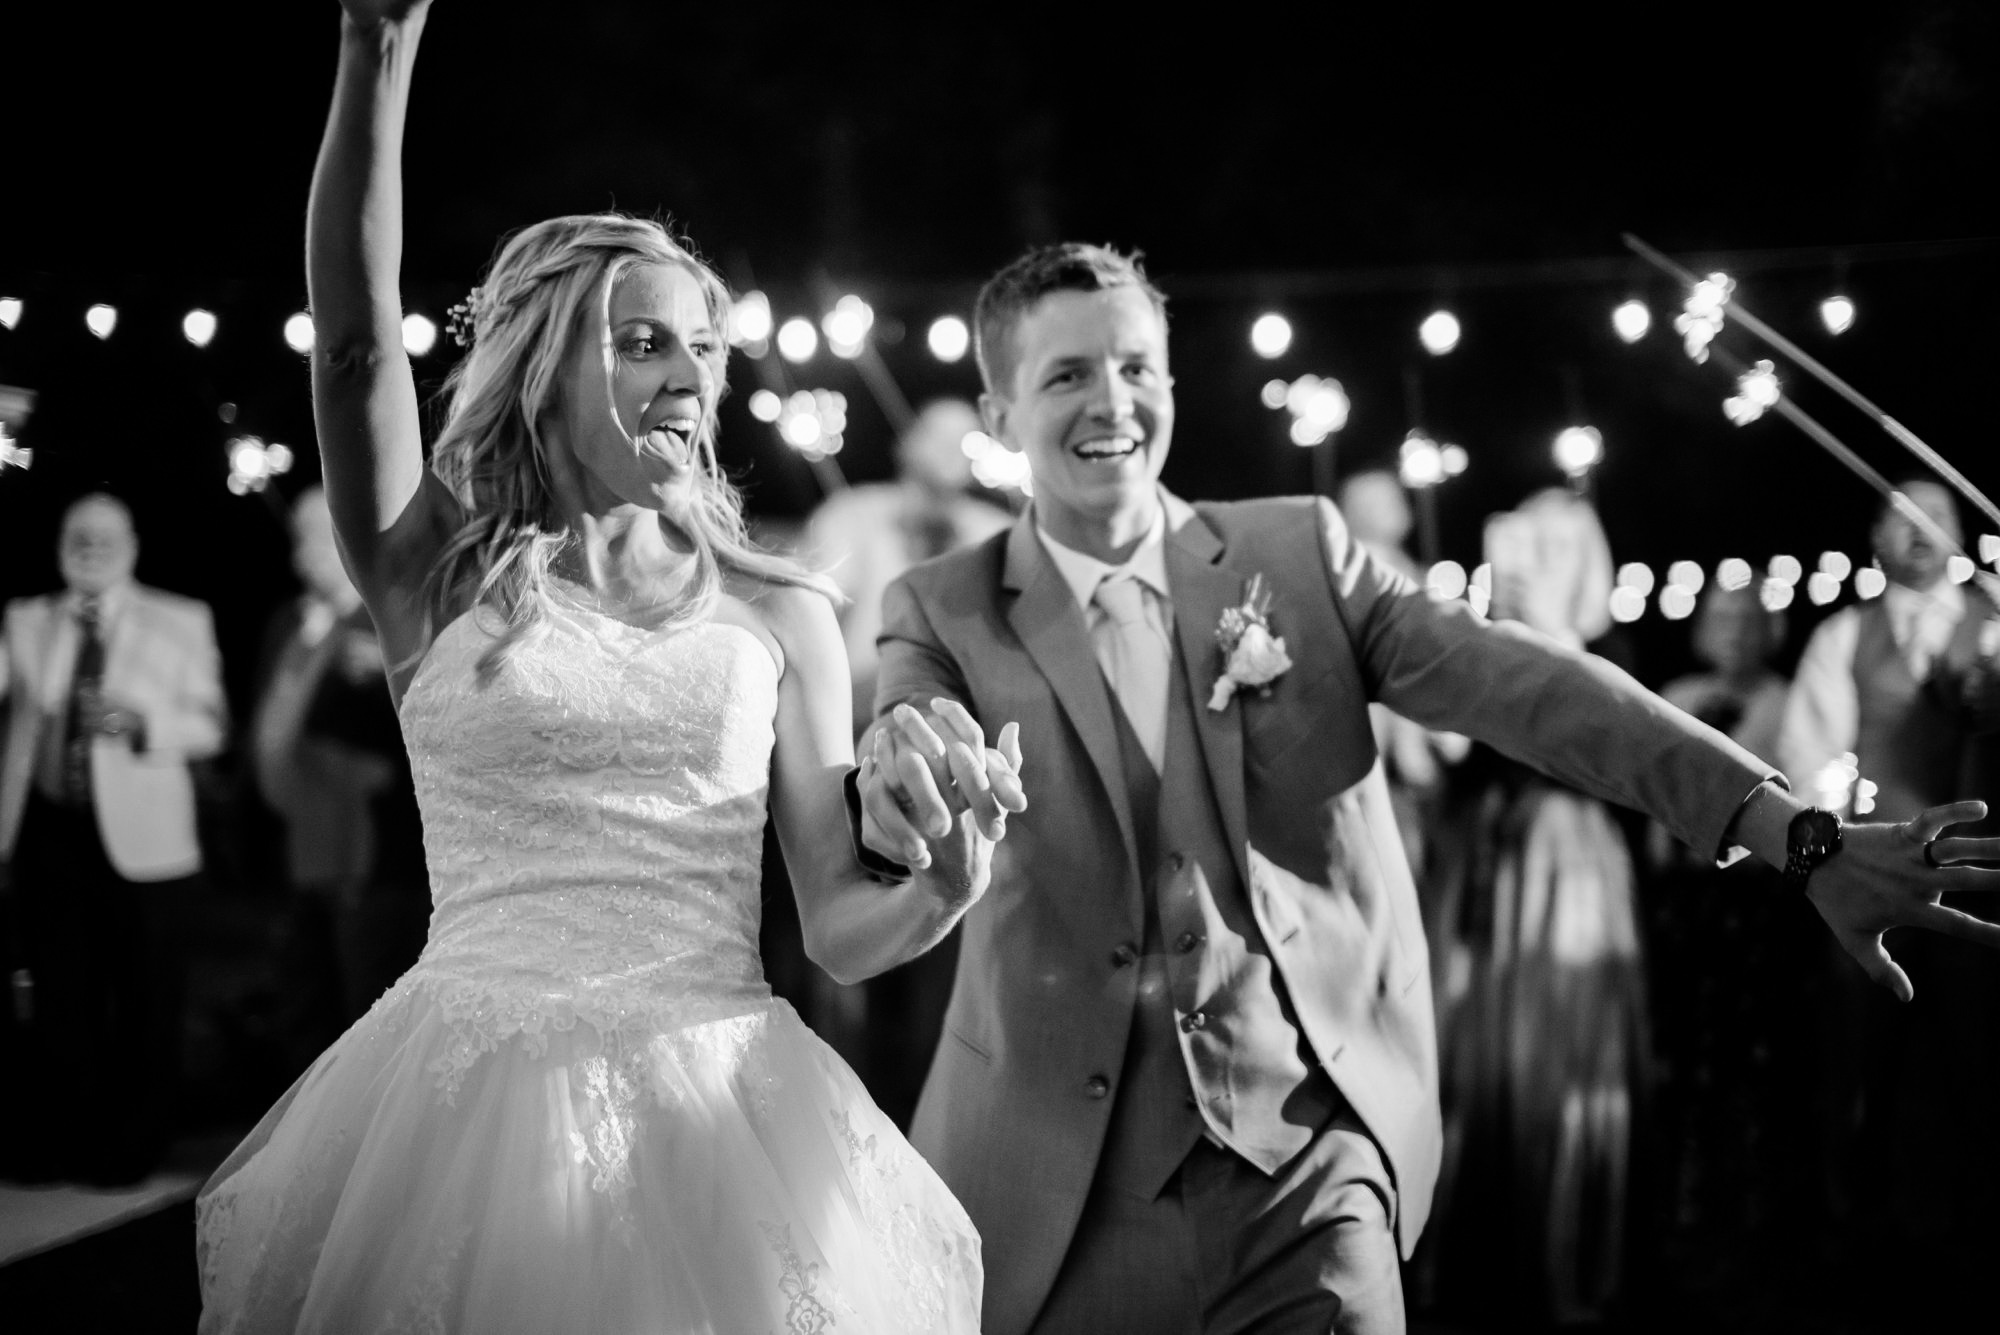 wedding-photography-virginia_0067.jpg